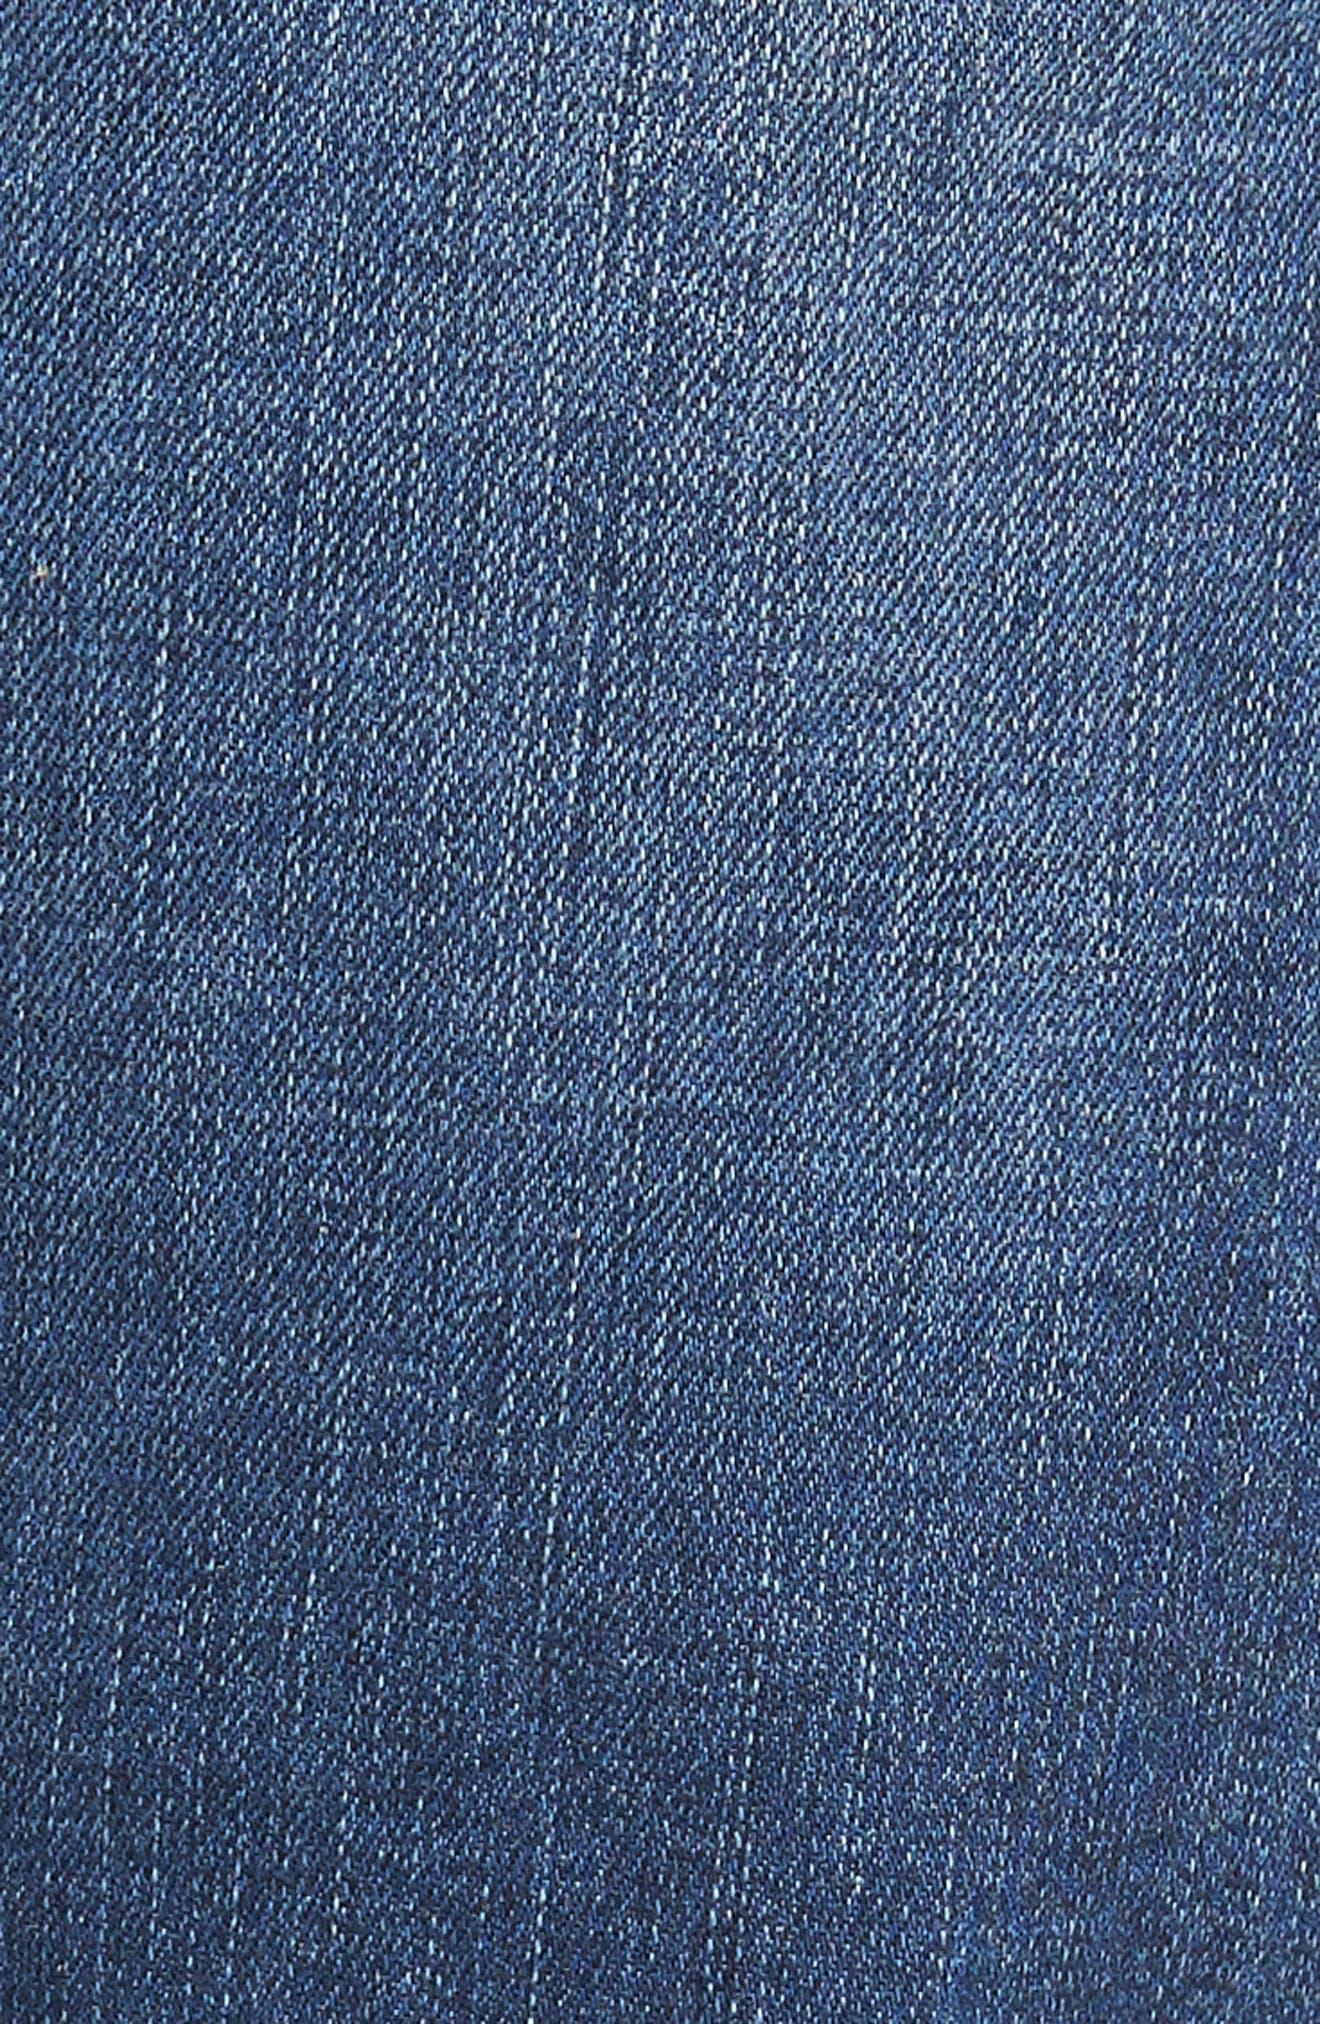 Zach Straight Leg Jeans,                             Alternate thumbnail 5, color,                             Indigo Cashmere